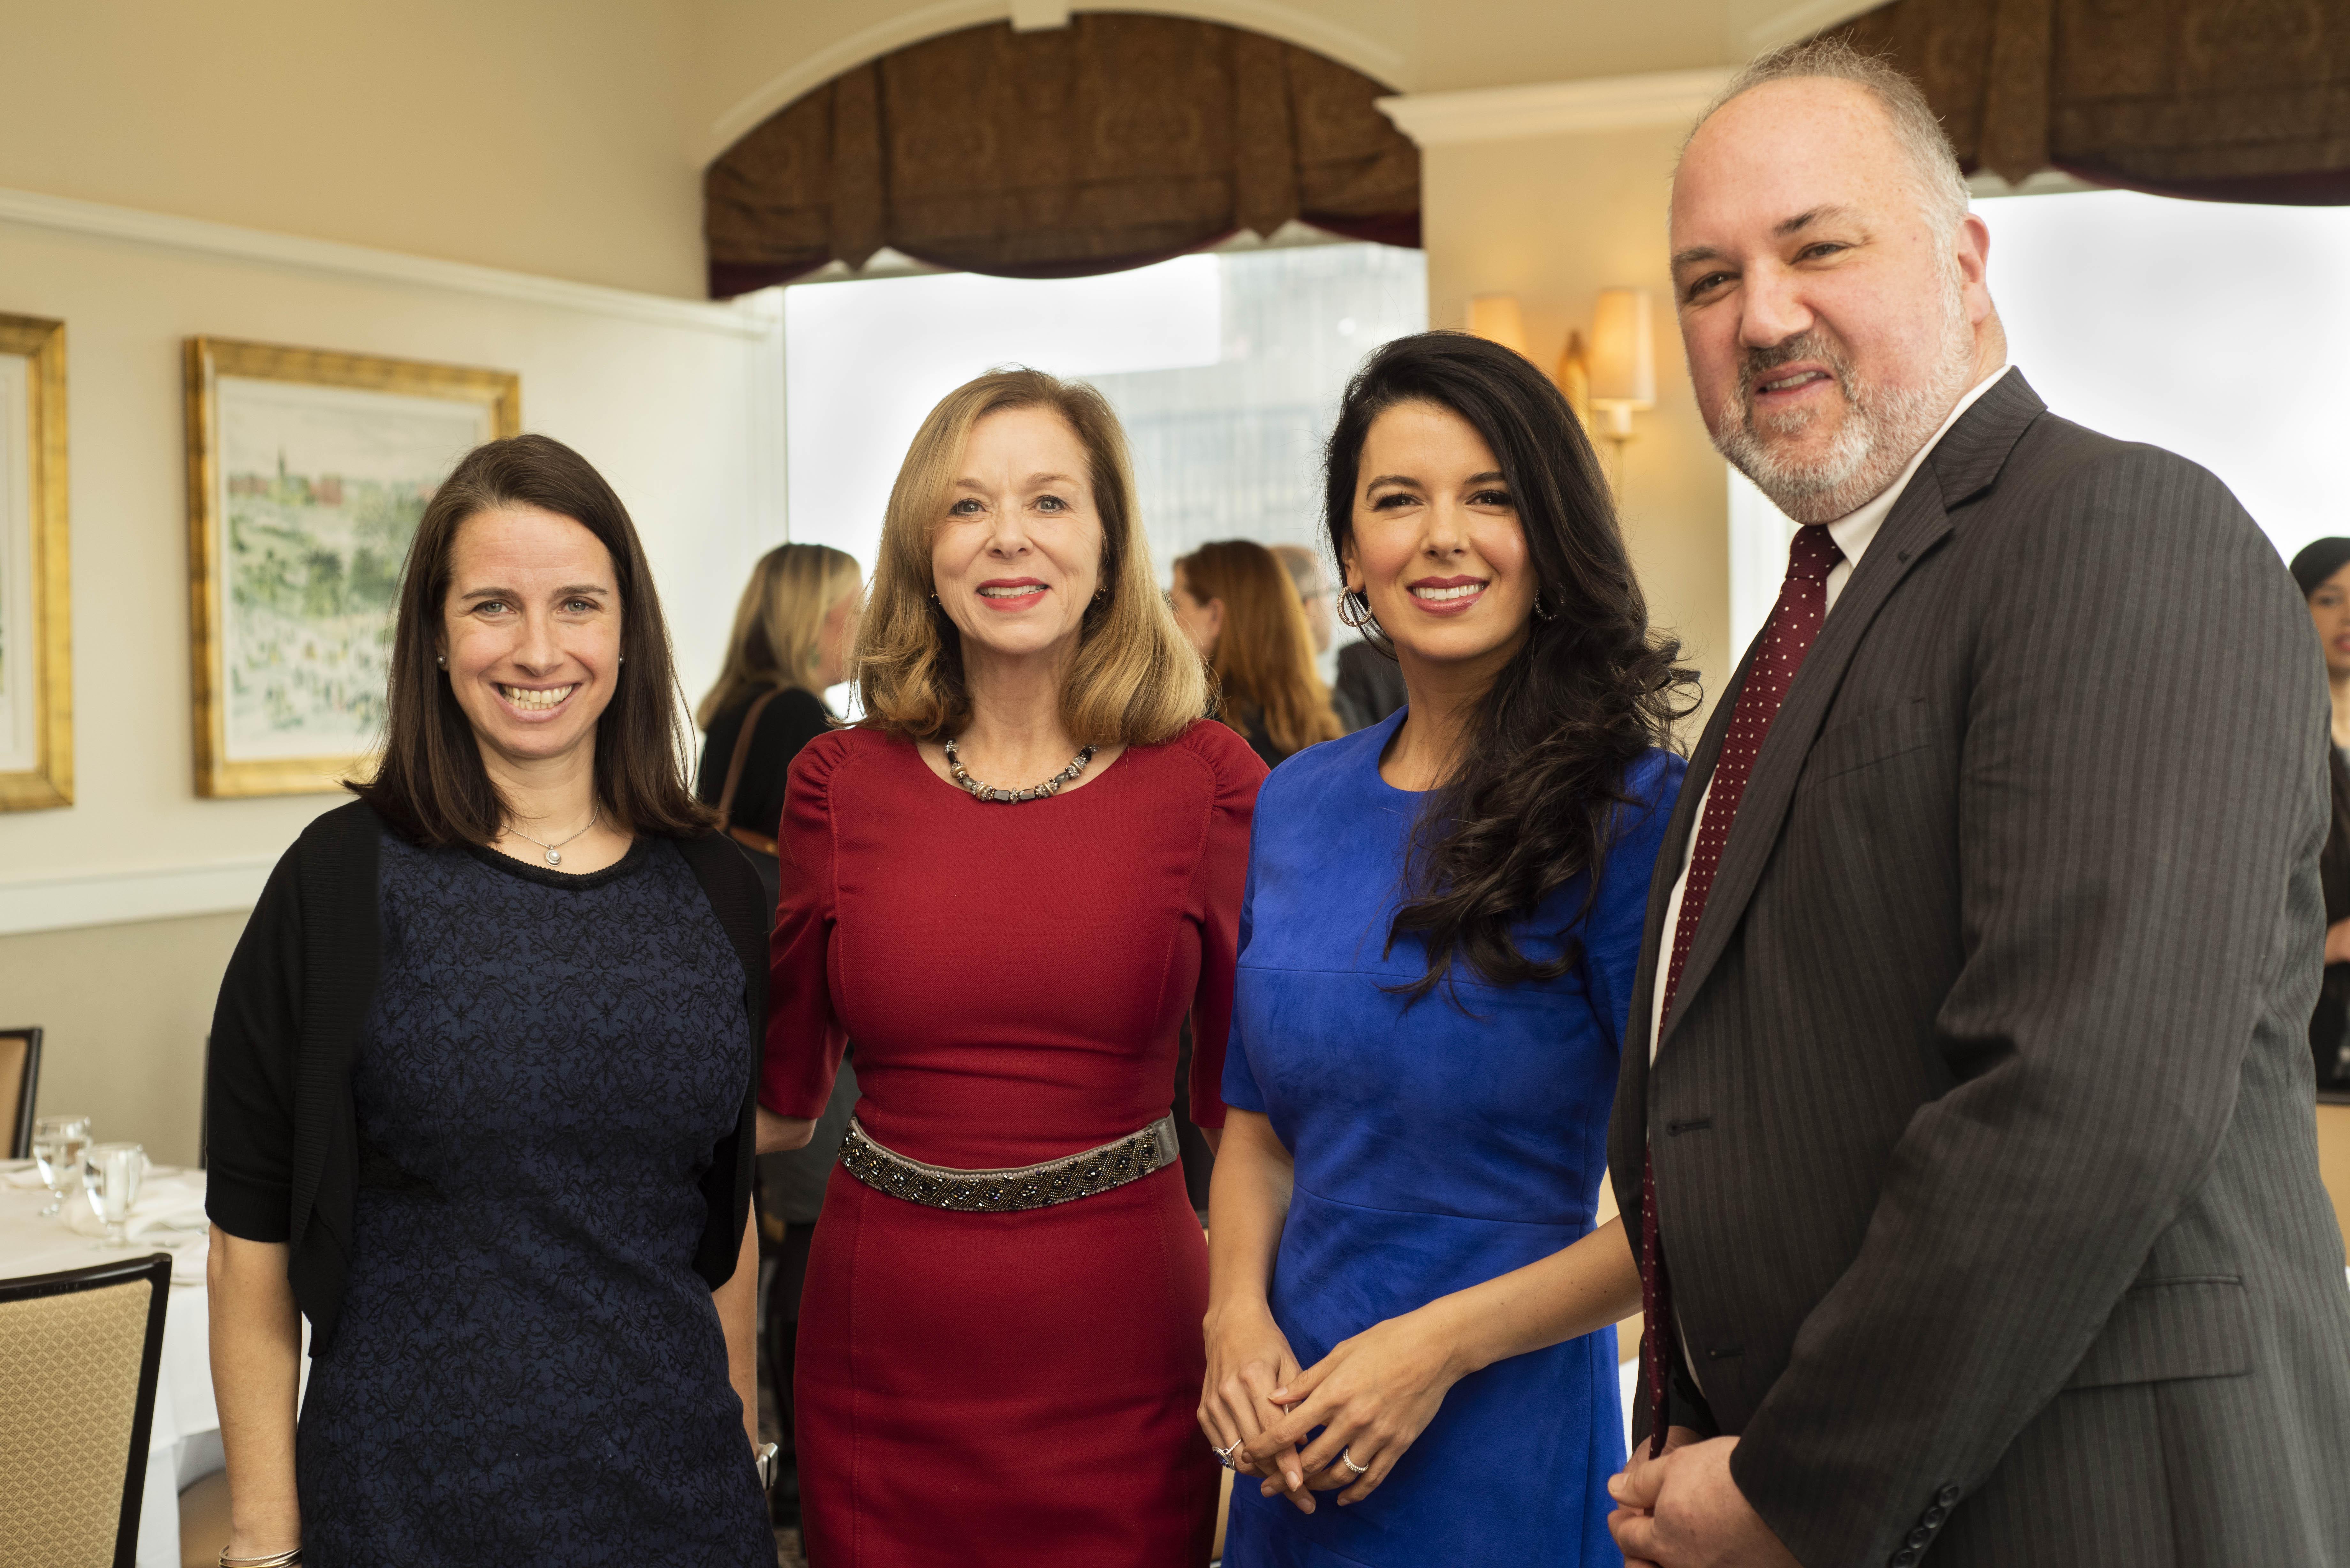 """In the News"" with Boston Globe Managing Director Linda Pizzuti Henry: 5 Takeaways"